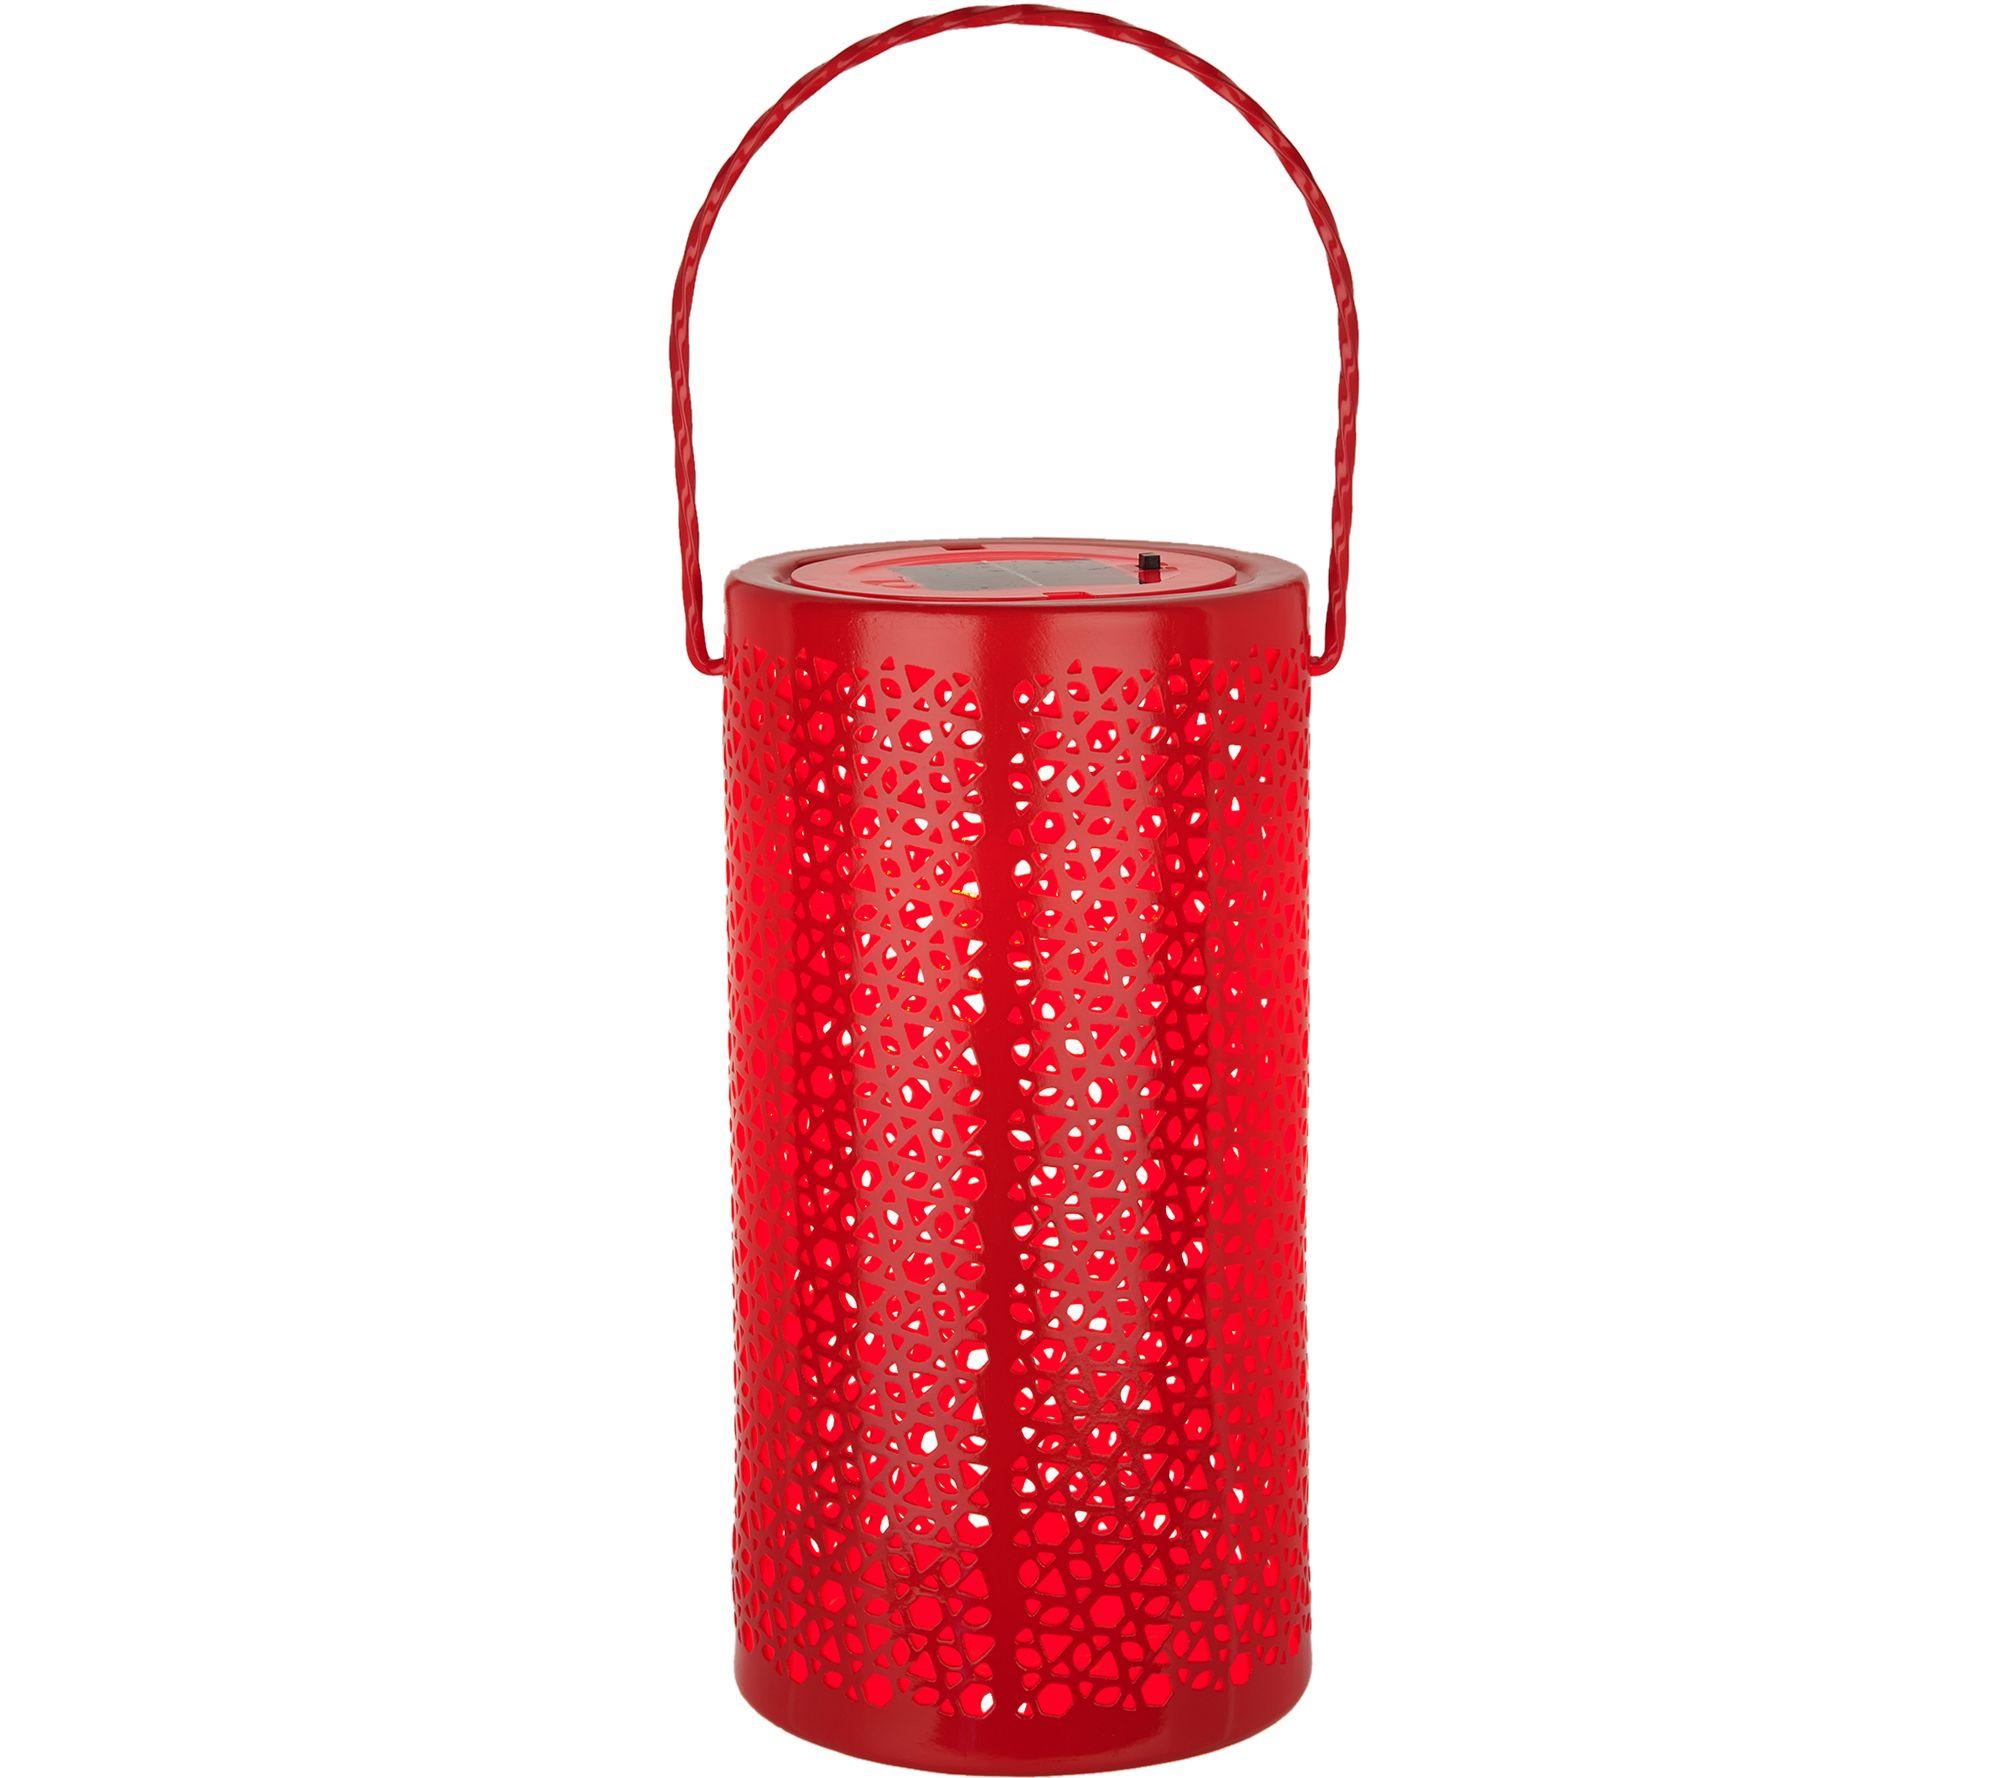 Small solar lights for crafts - Plow Hearth Solar Ceramic Hanging Lantern M52339